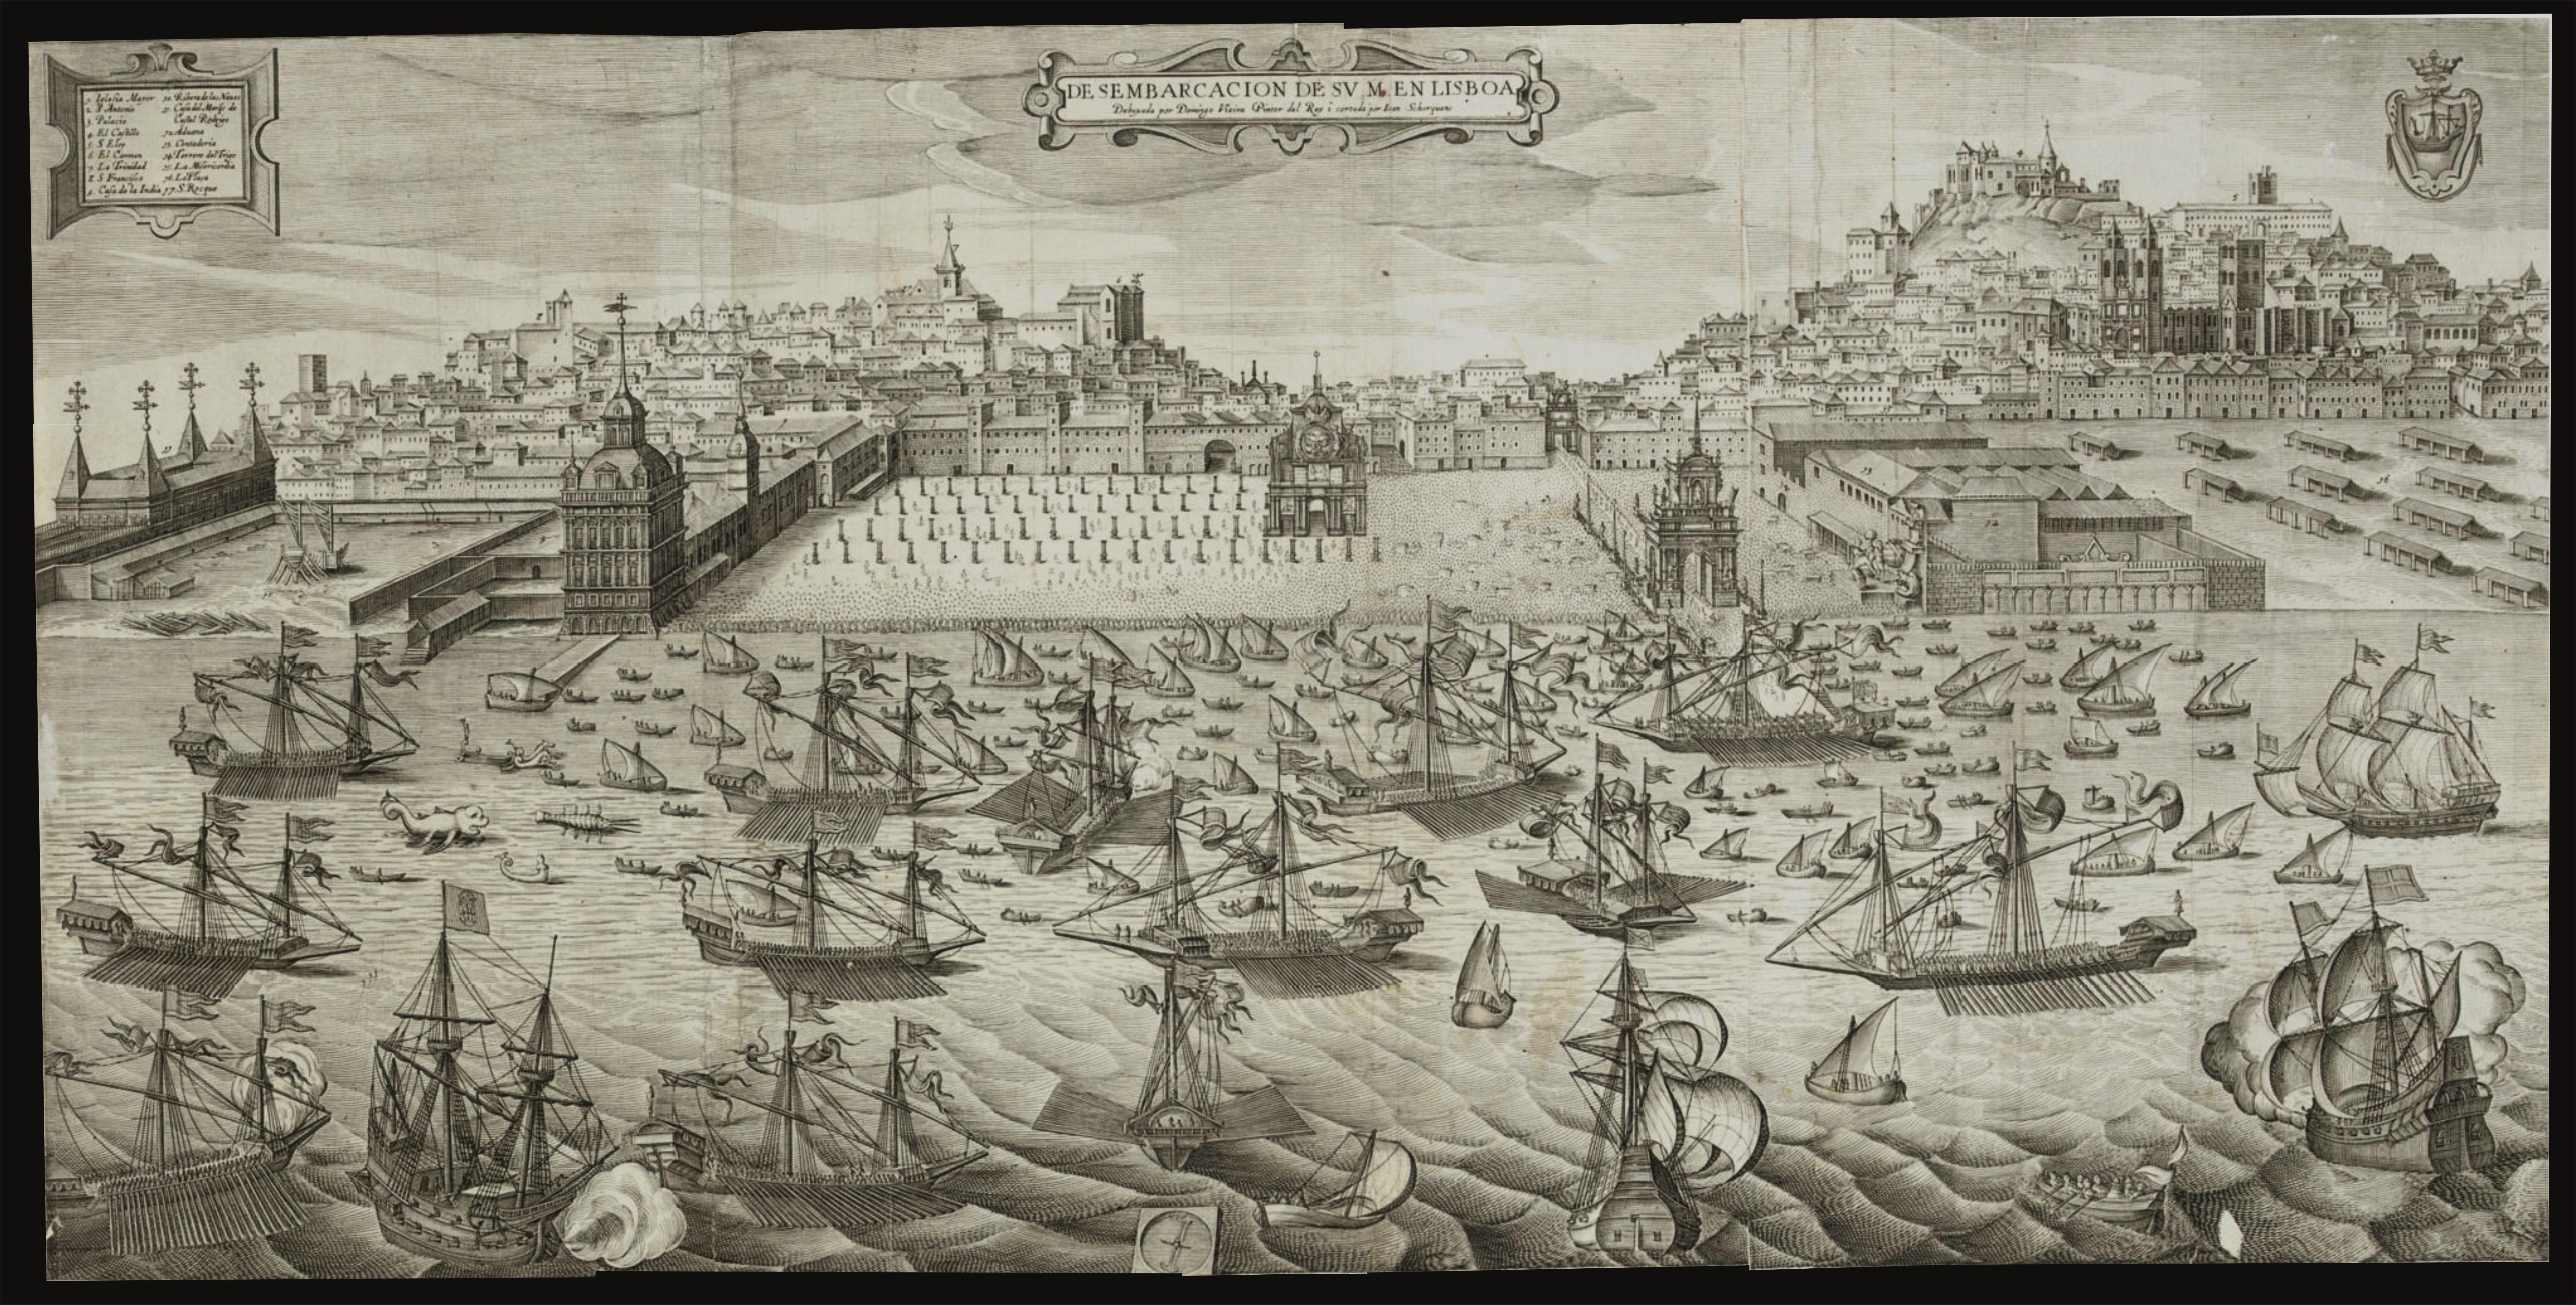 File:Lisboa em 1619.jpg